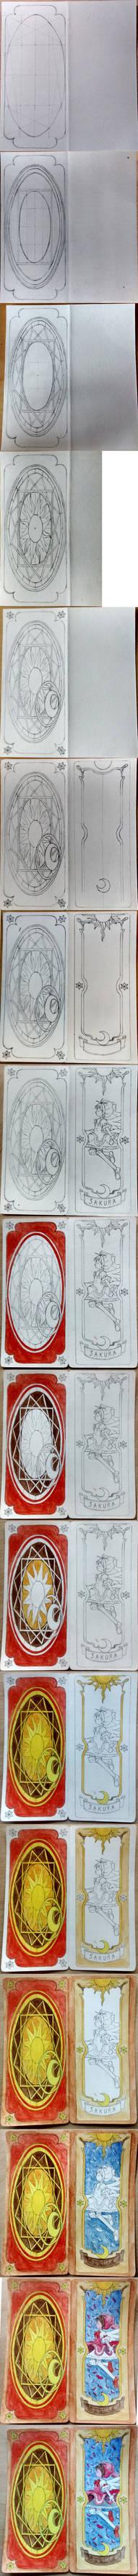 Sakura Card Captor - Birthday card (WIP)